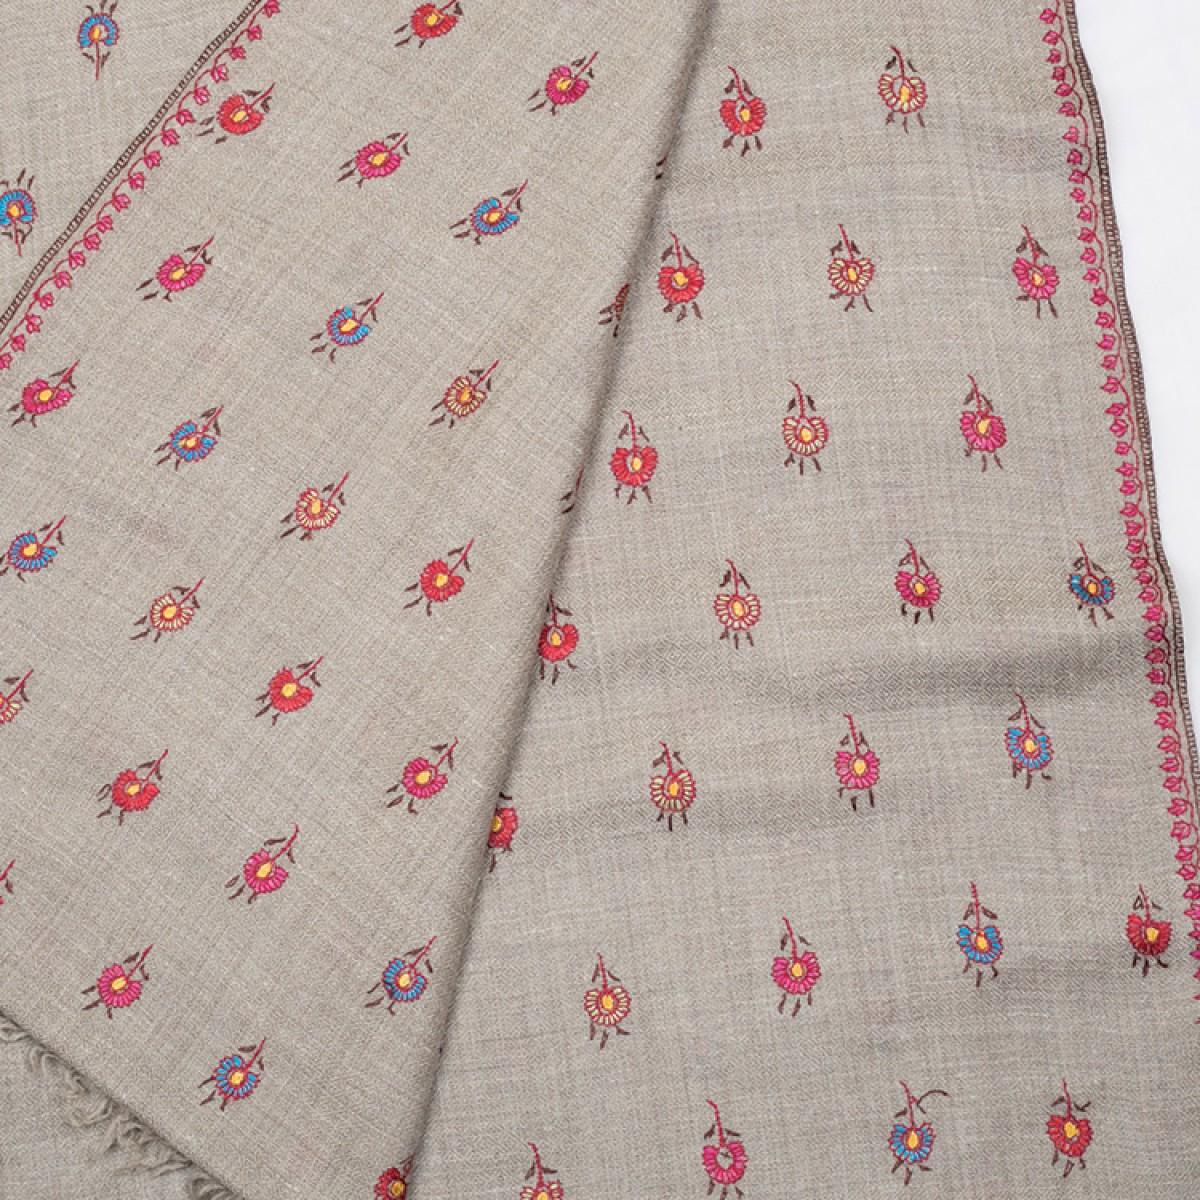 Embroidered Pashmina Stole - Natural & Multi